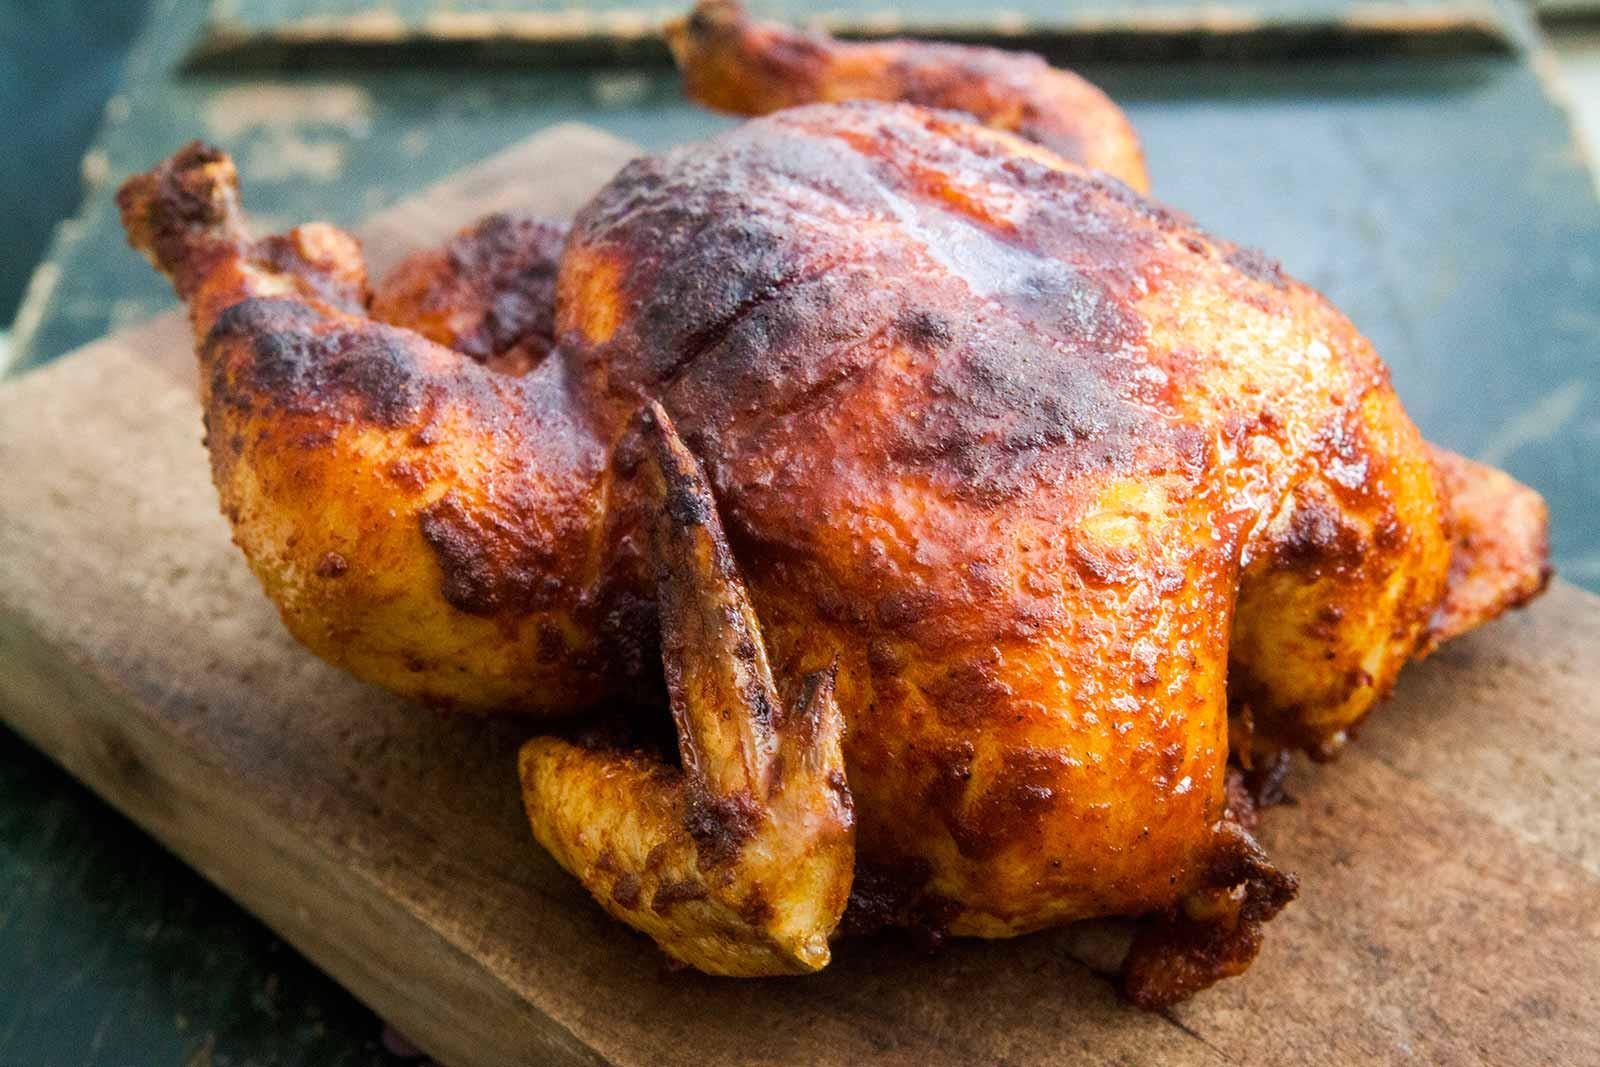 Baked Chicken Whole  Smoked Paprika Roast Chicken Recipe